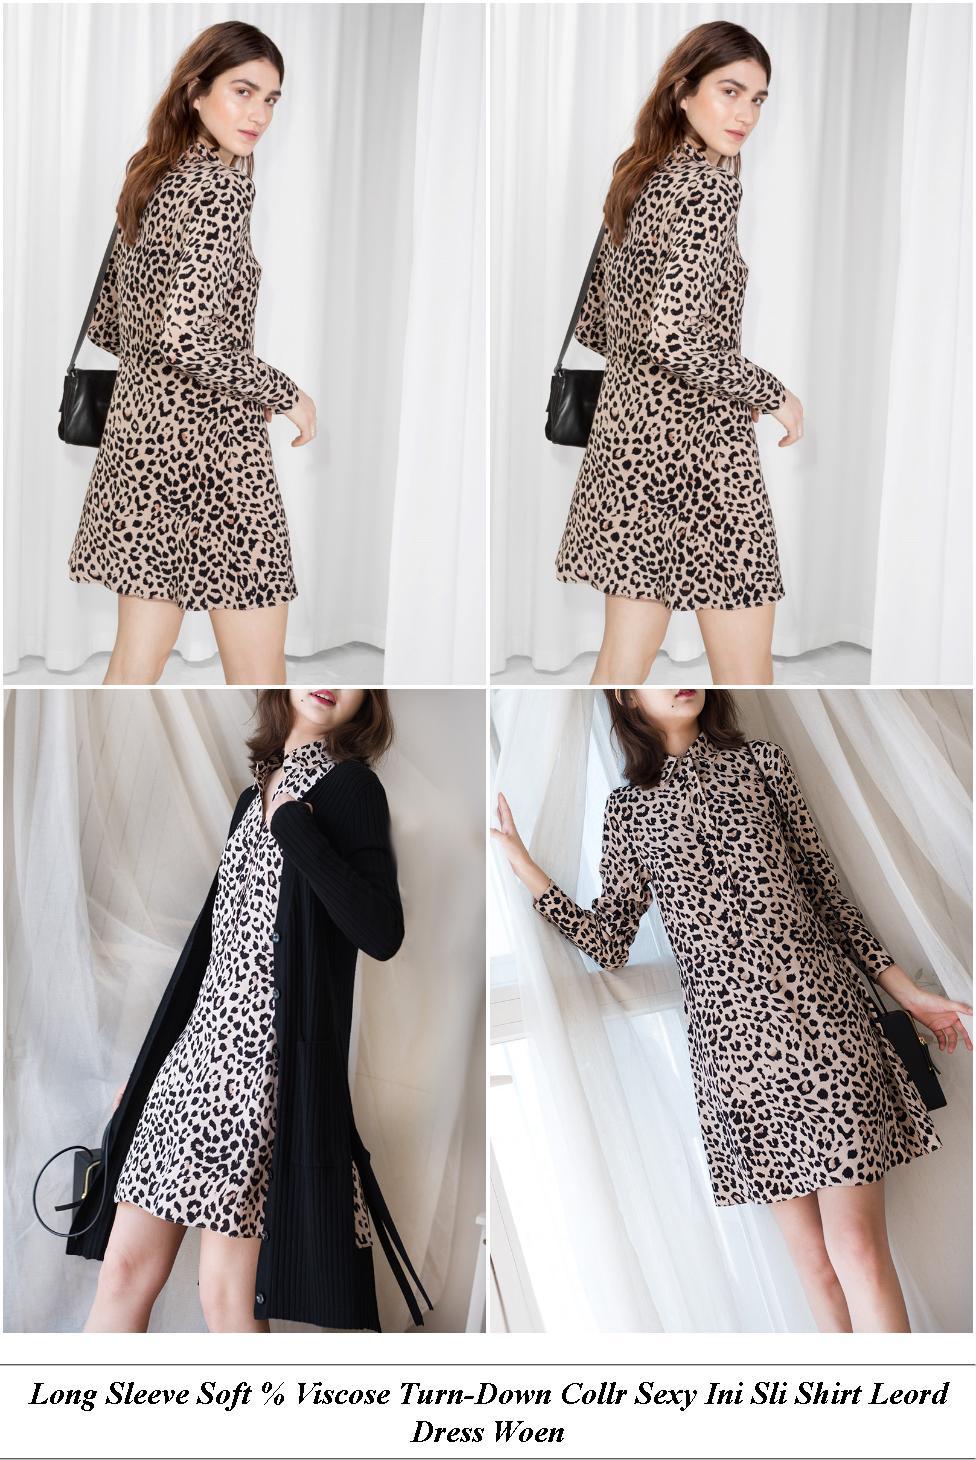 Free Dress Sewing Patterns Pdf - Online Discount Sales - Lack Off The Shoulder Dress Amazon